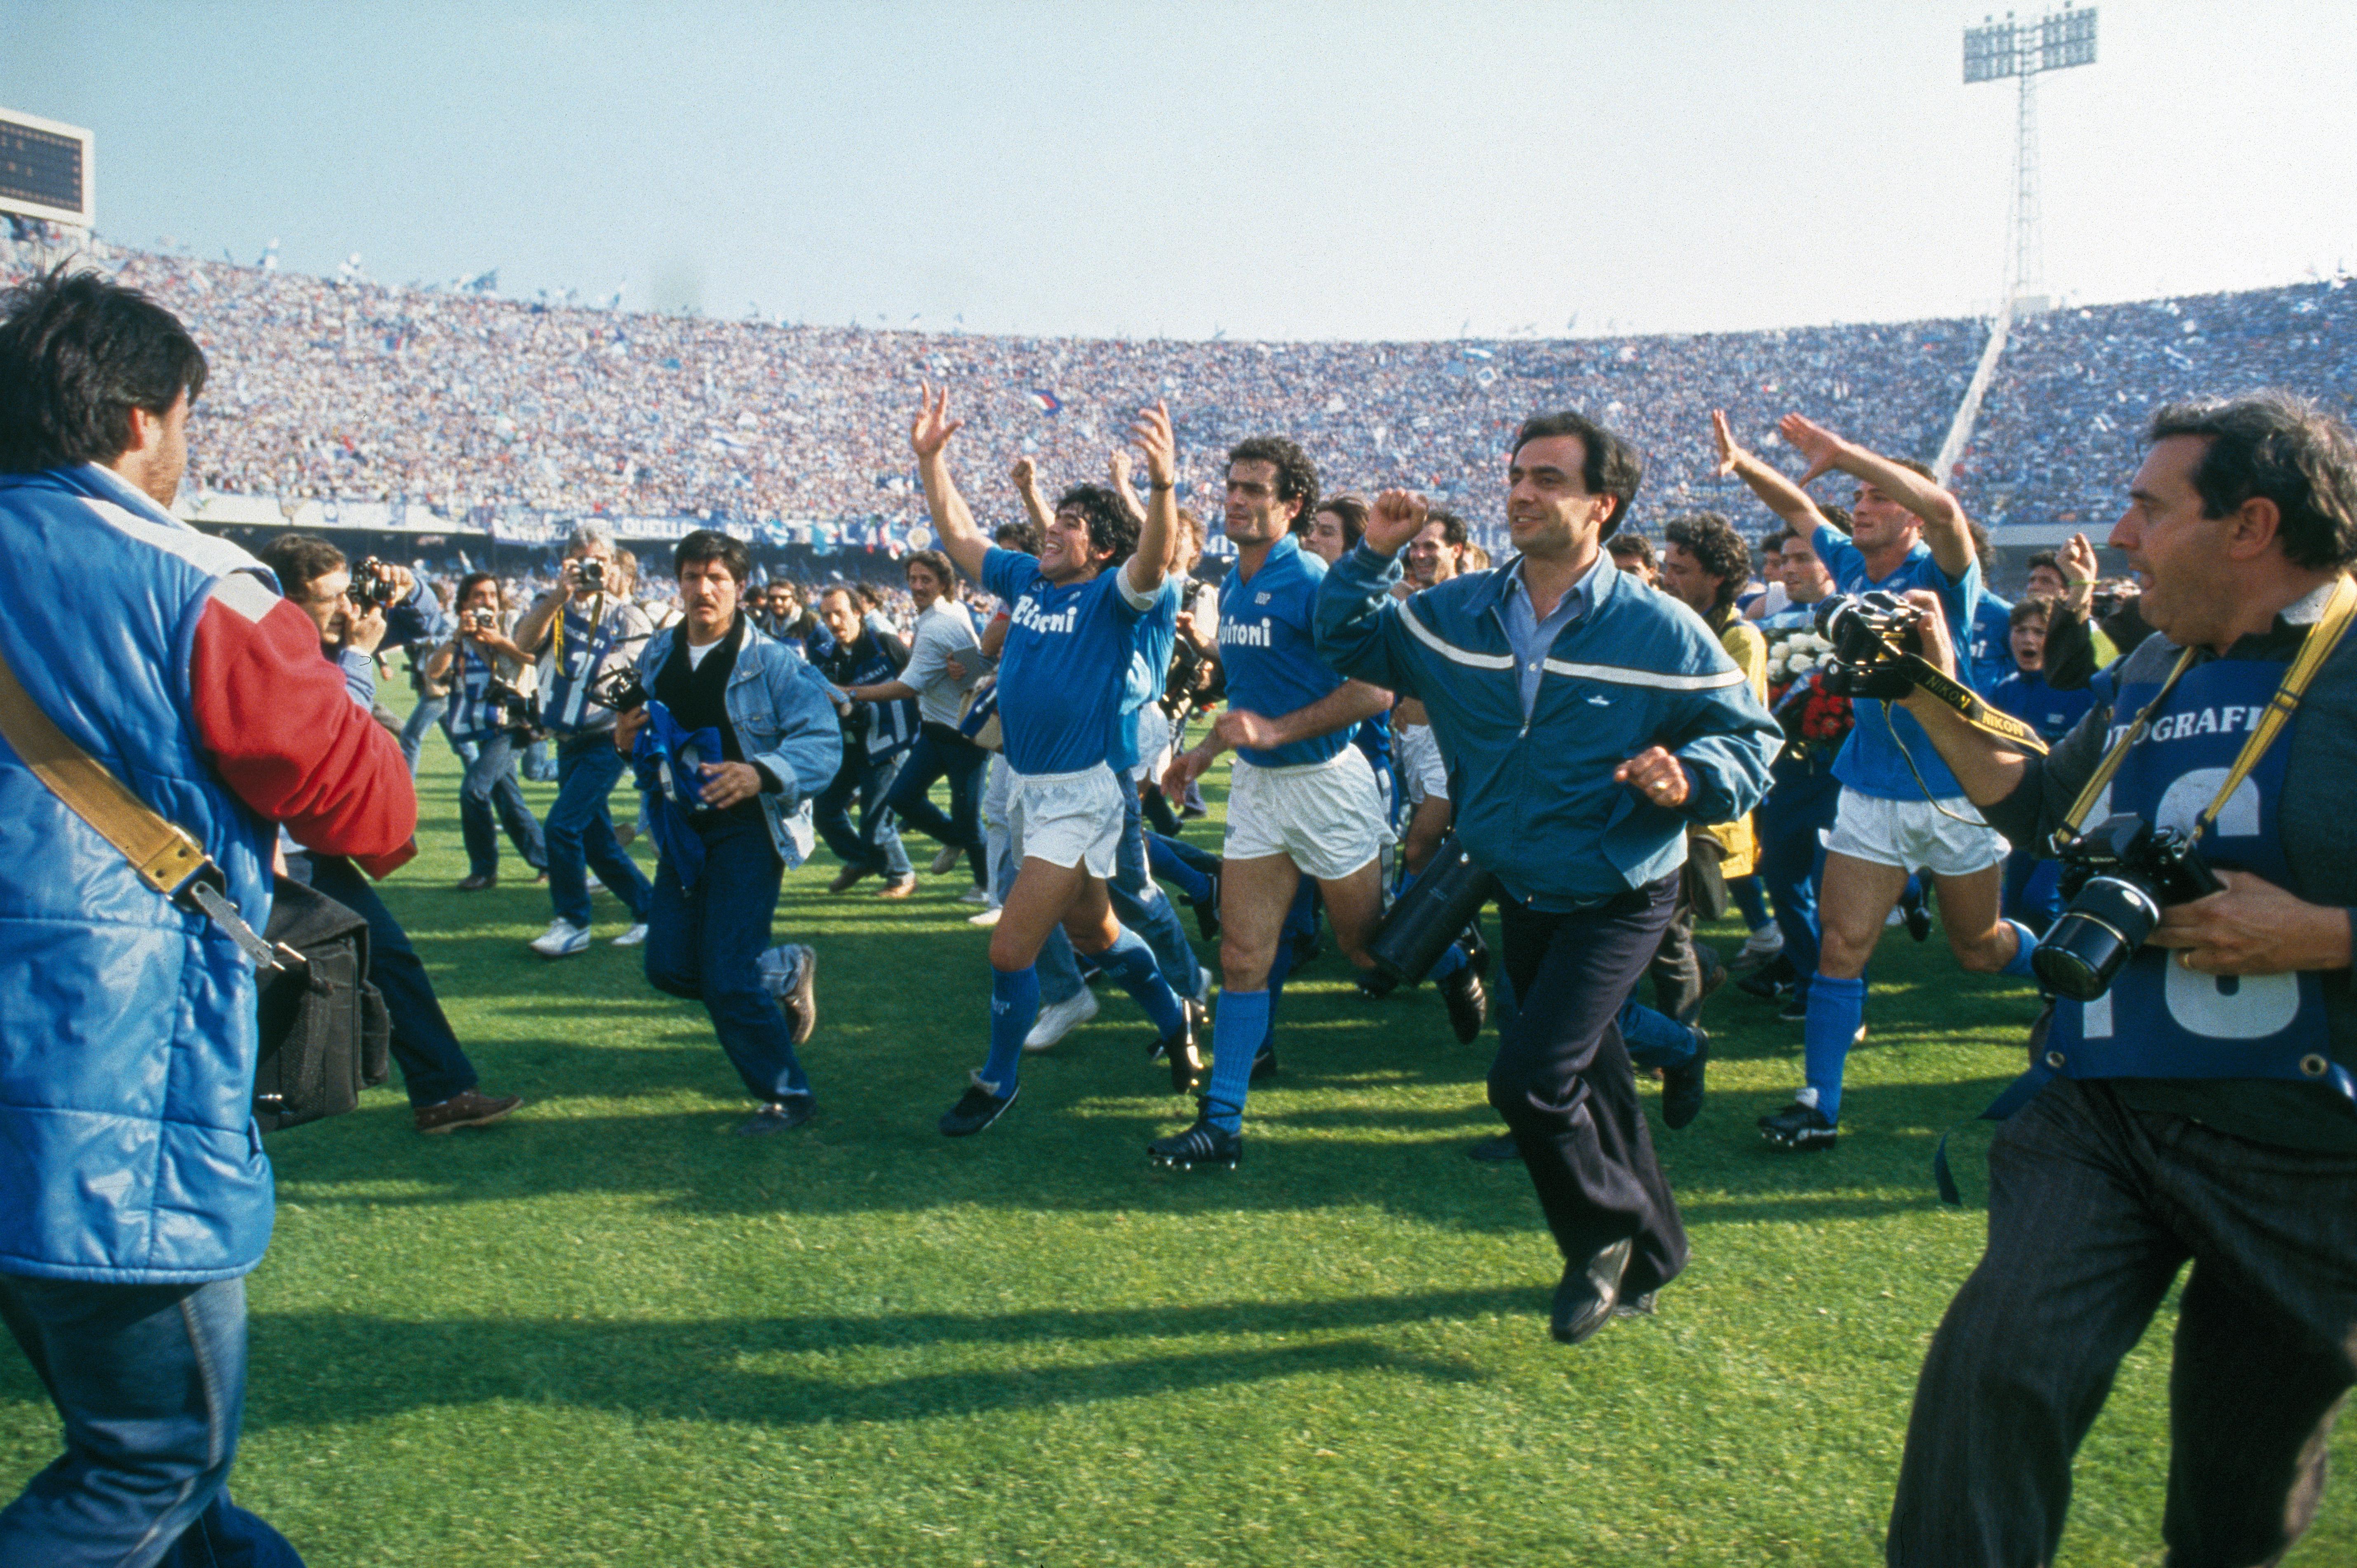 Buy a classic sport photograph: Maradona, the 'God of Naples'